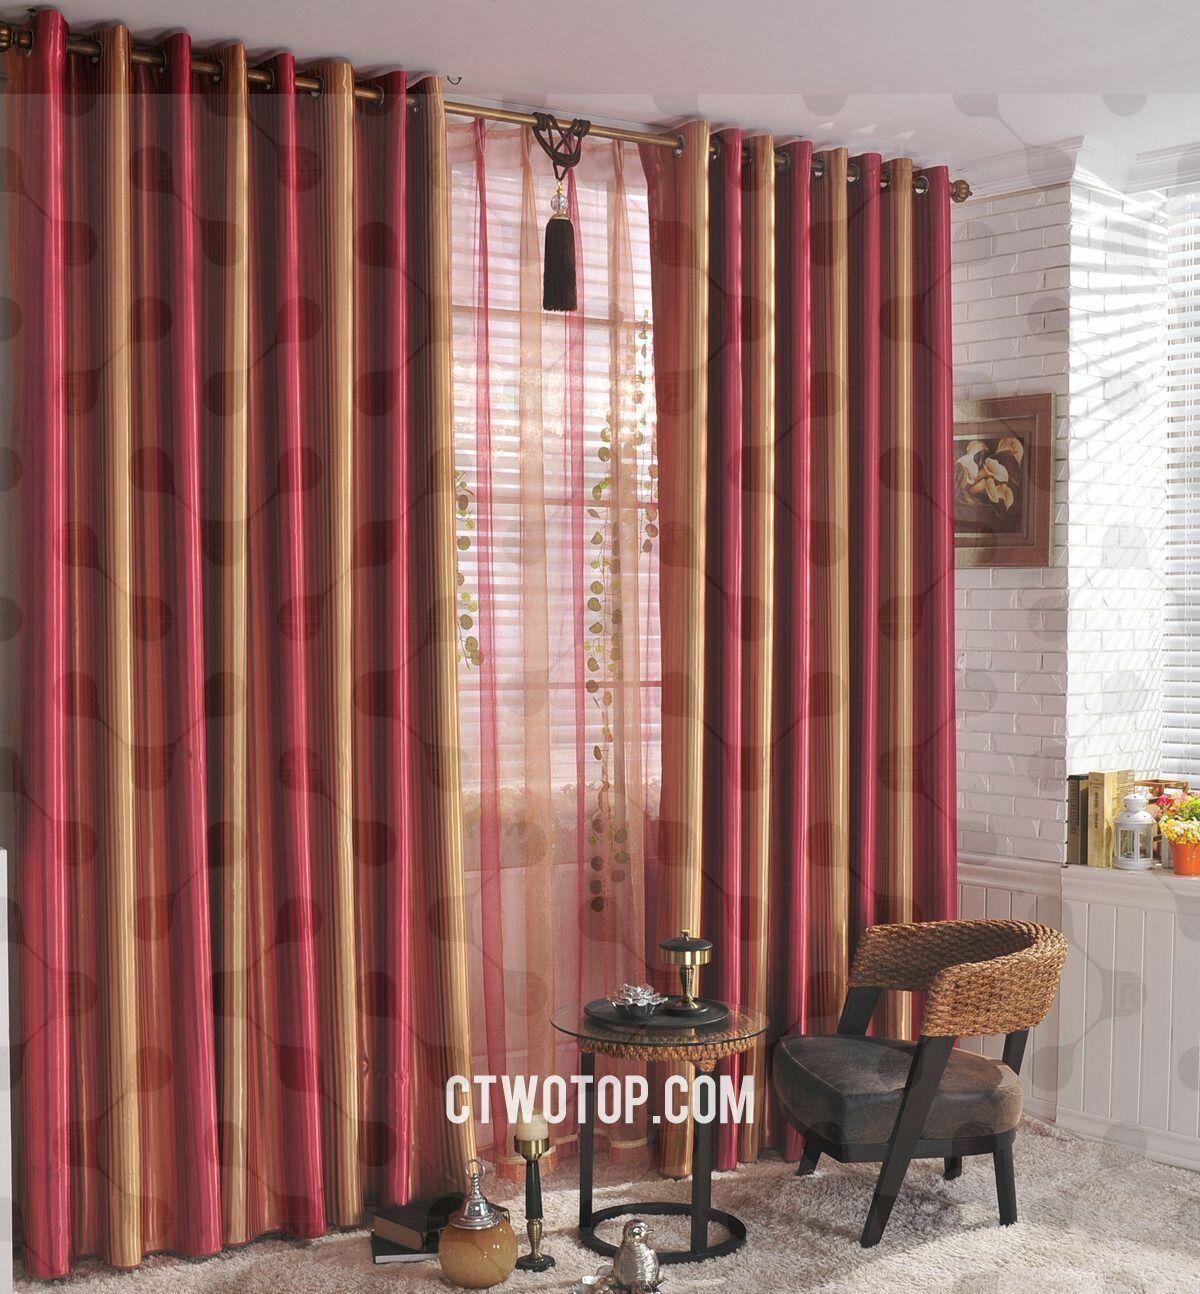 10 Ravishing Living Room Curtains Neutral Ideas Curtains Living Room Brown Curtains Red Curtains #red #and #grey #curtains #for #living #room